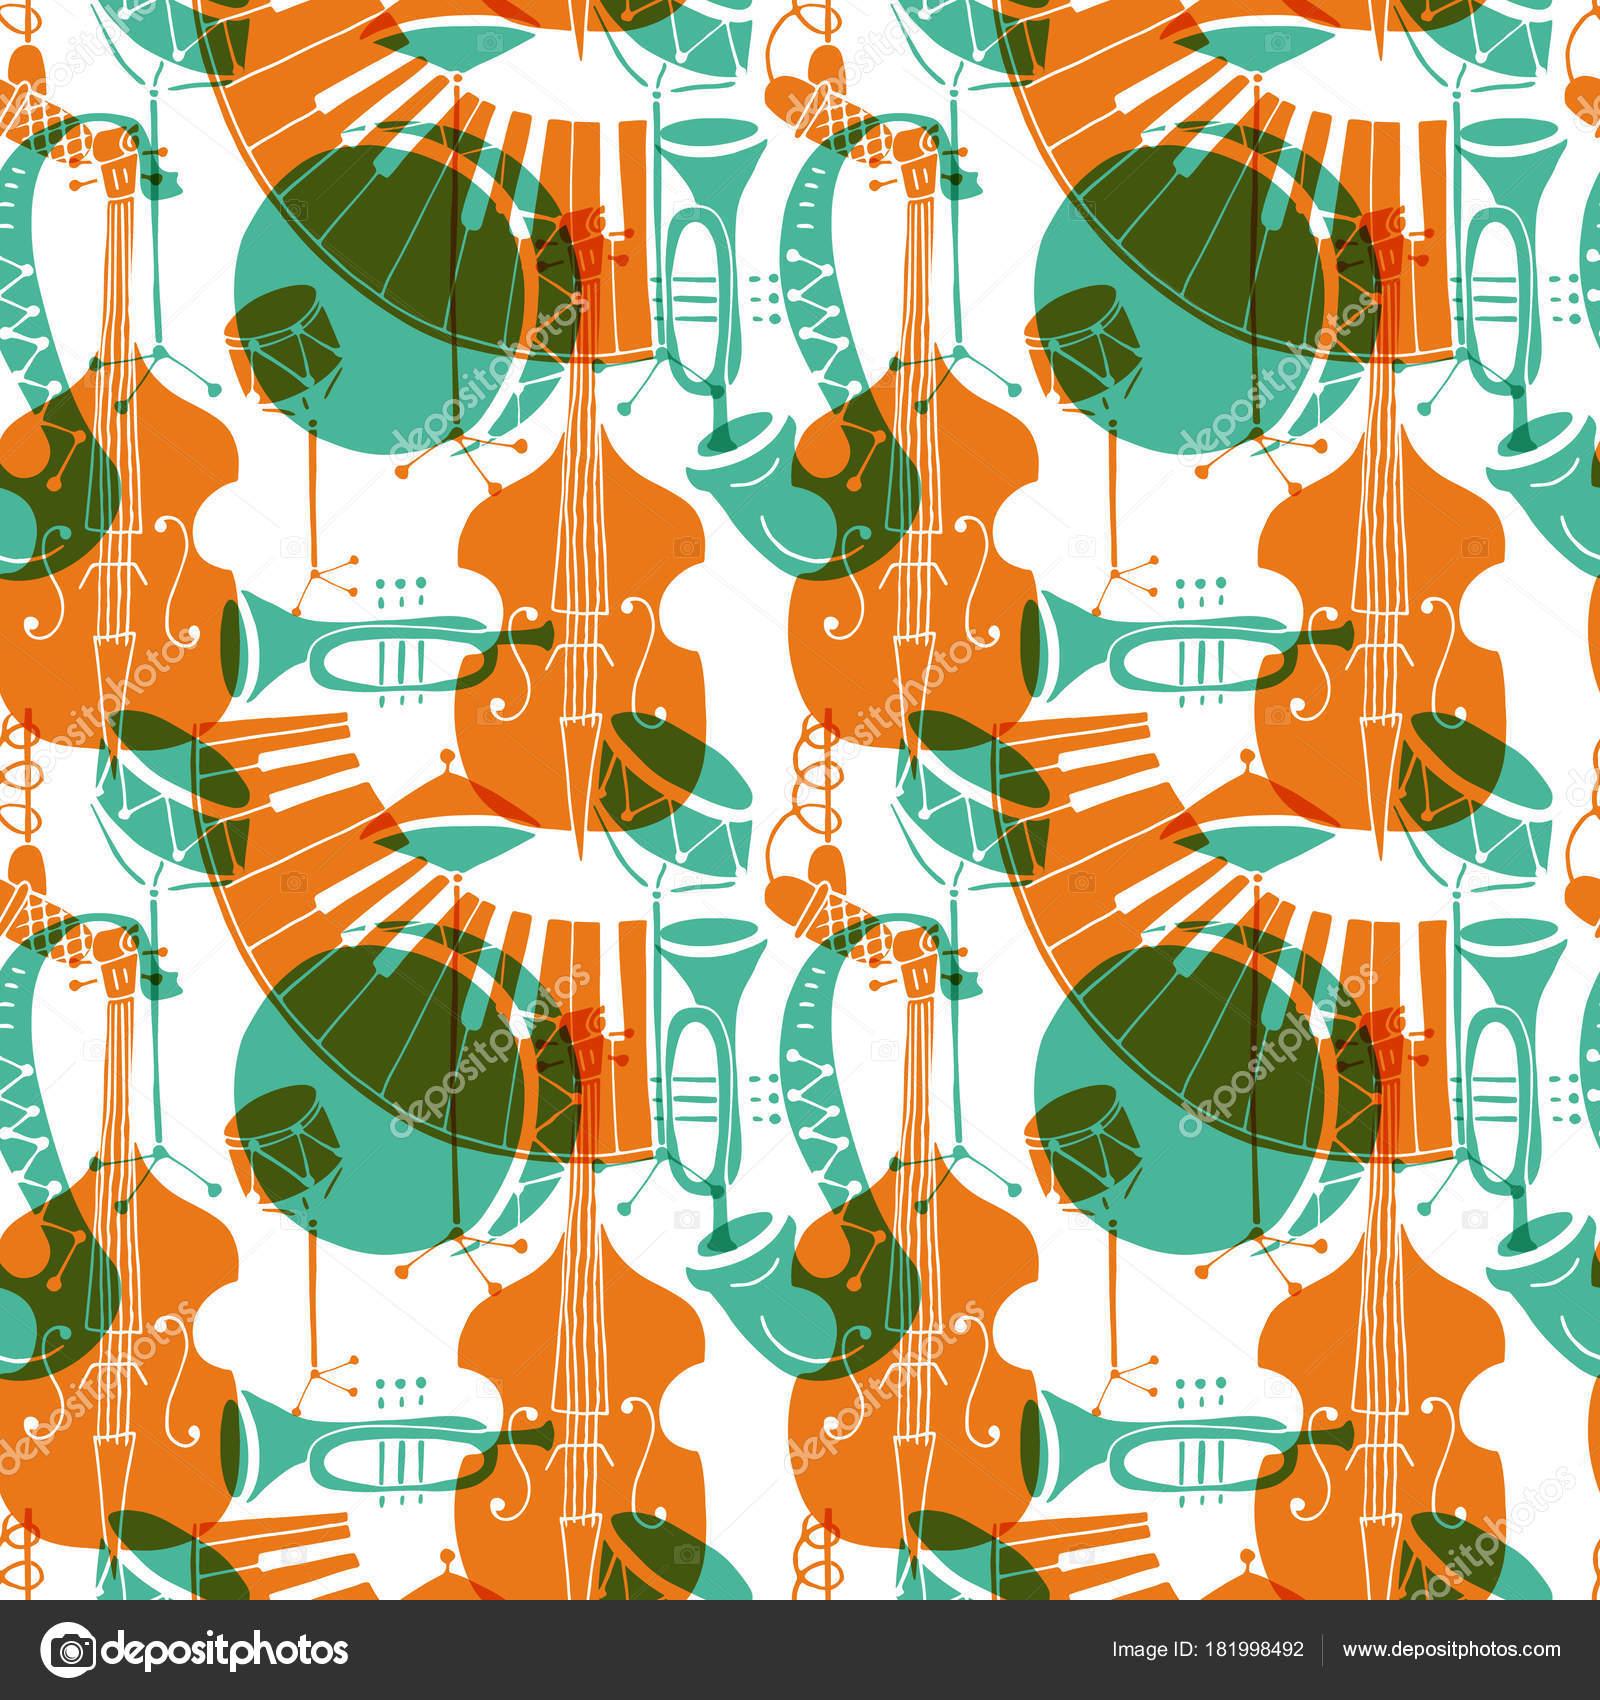 Seamless Pattern Music Instruments Trombone Trumpet Double Bass Saxophone Bass Stock Vector C Darijashka